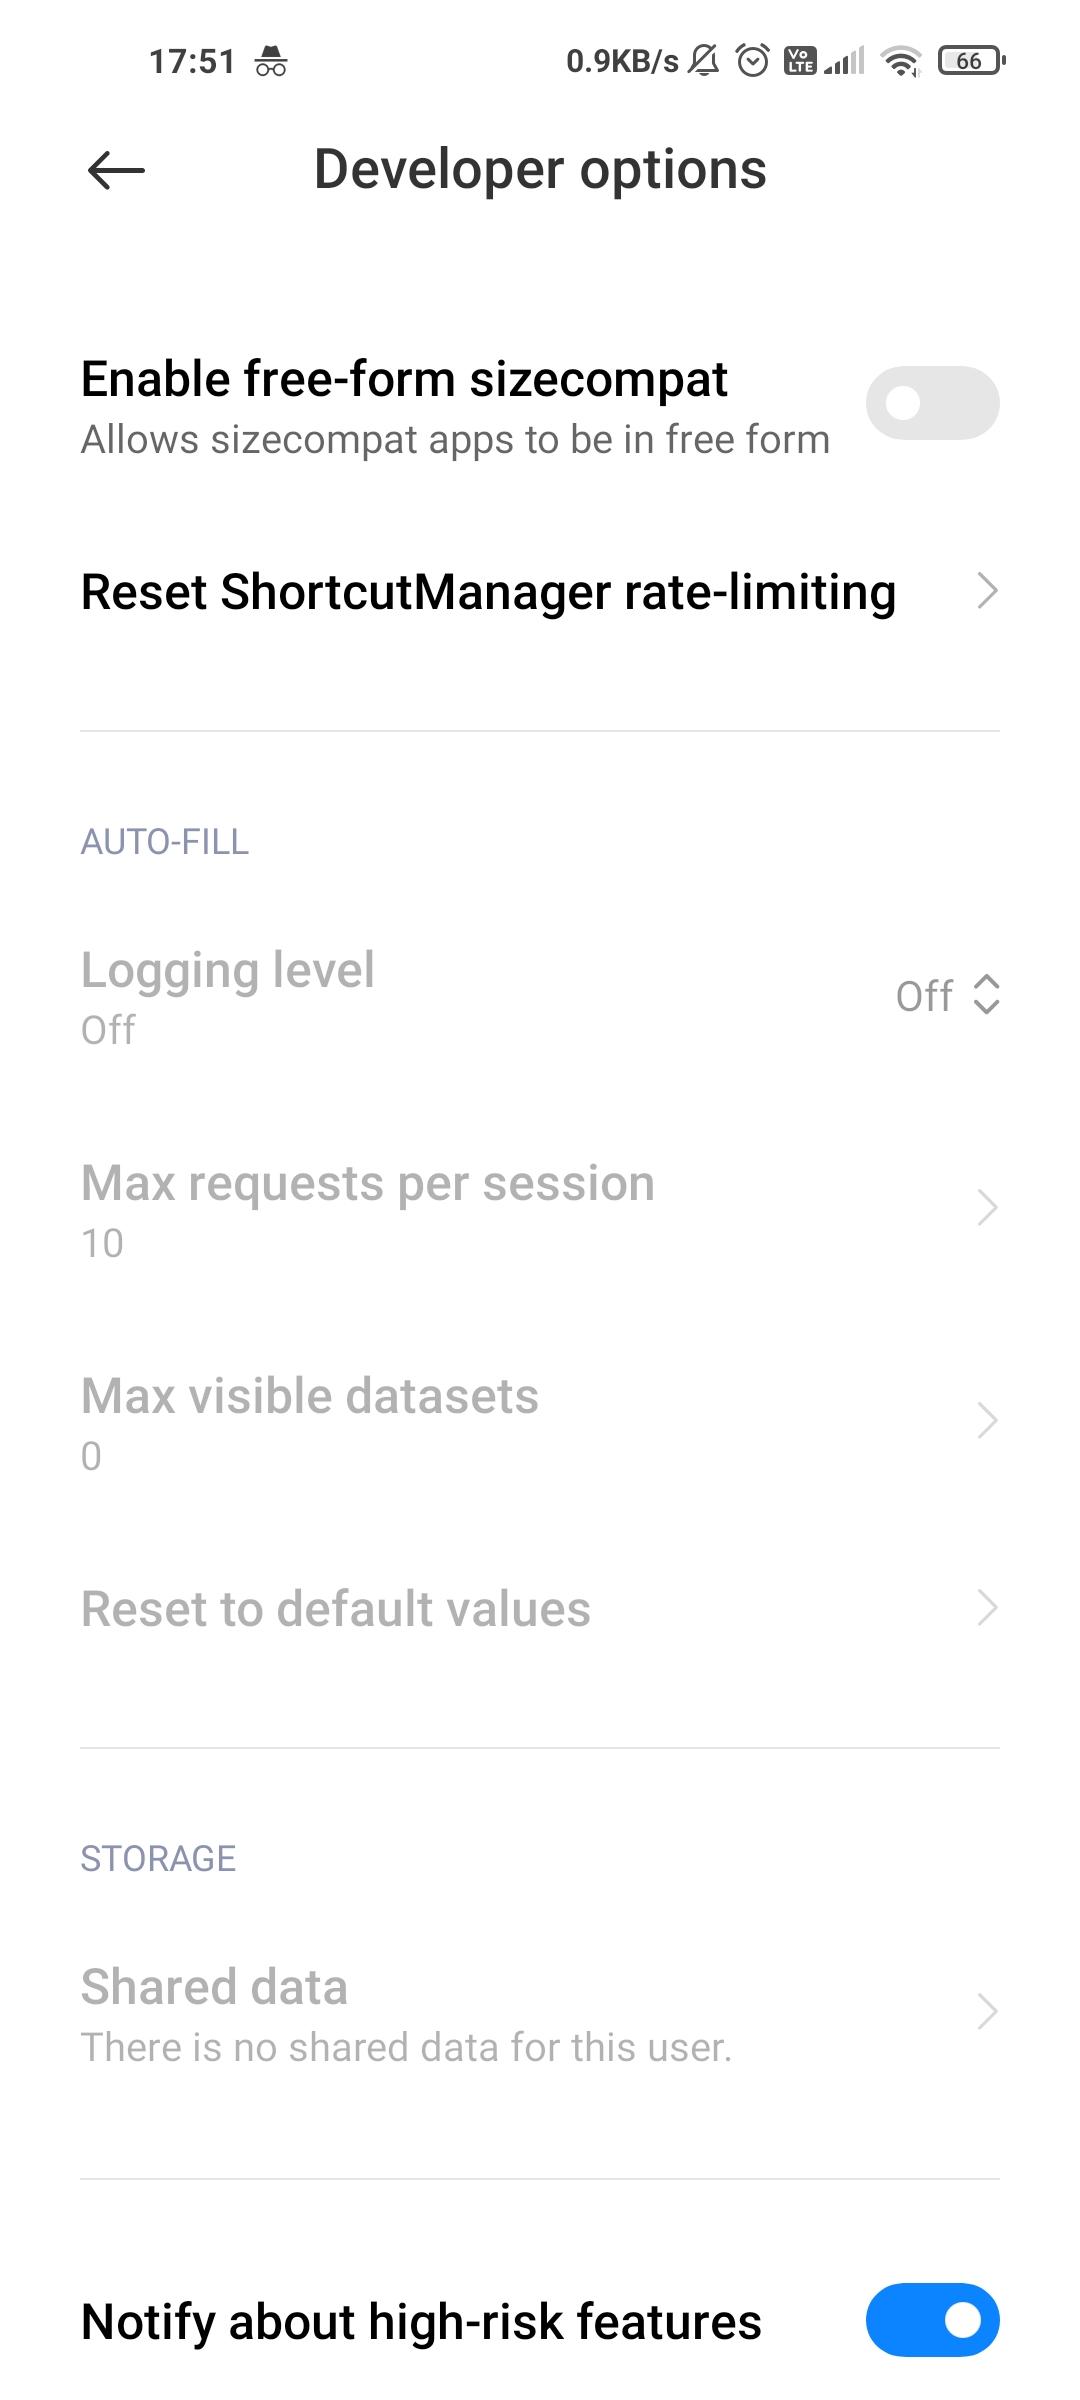 Screenshot_2021-04-30-17-51-16-376_com.android.settings.jpg